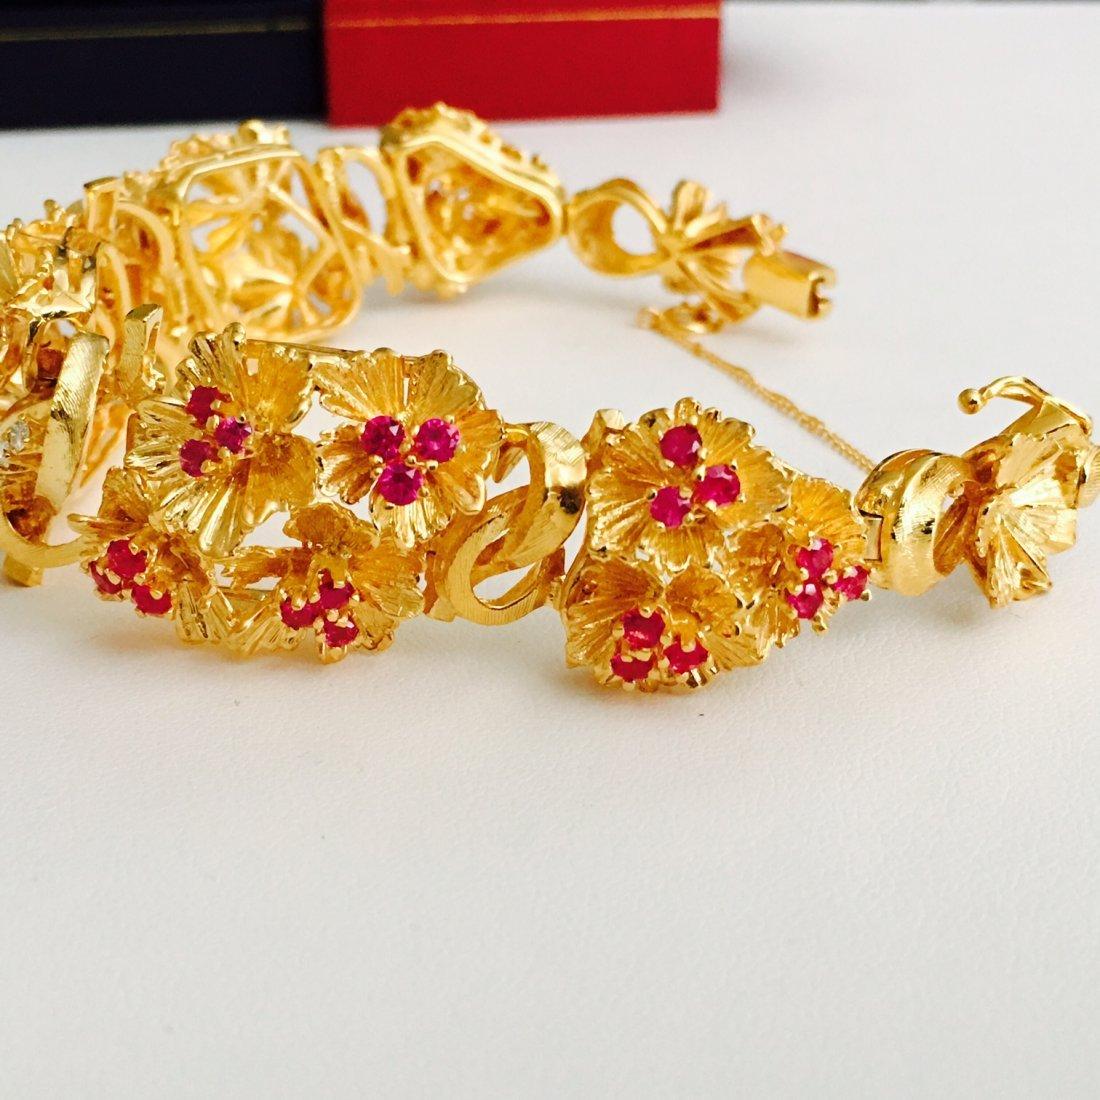 Vinatge 18K Gold 7 CARAT Burma Ruby Diamond Bracelet - 2